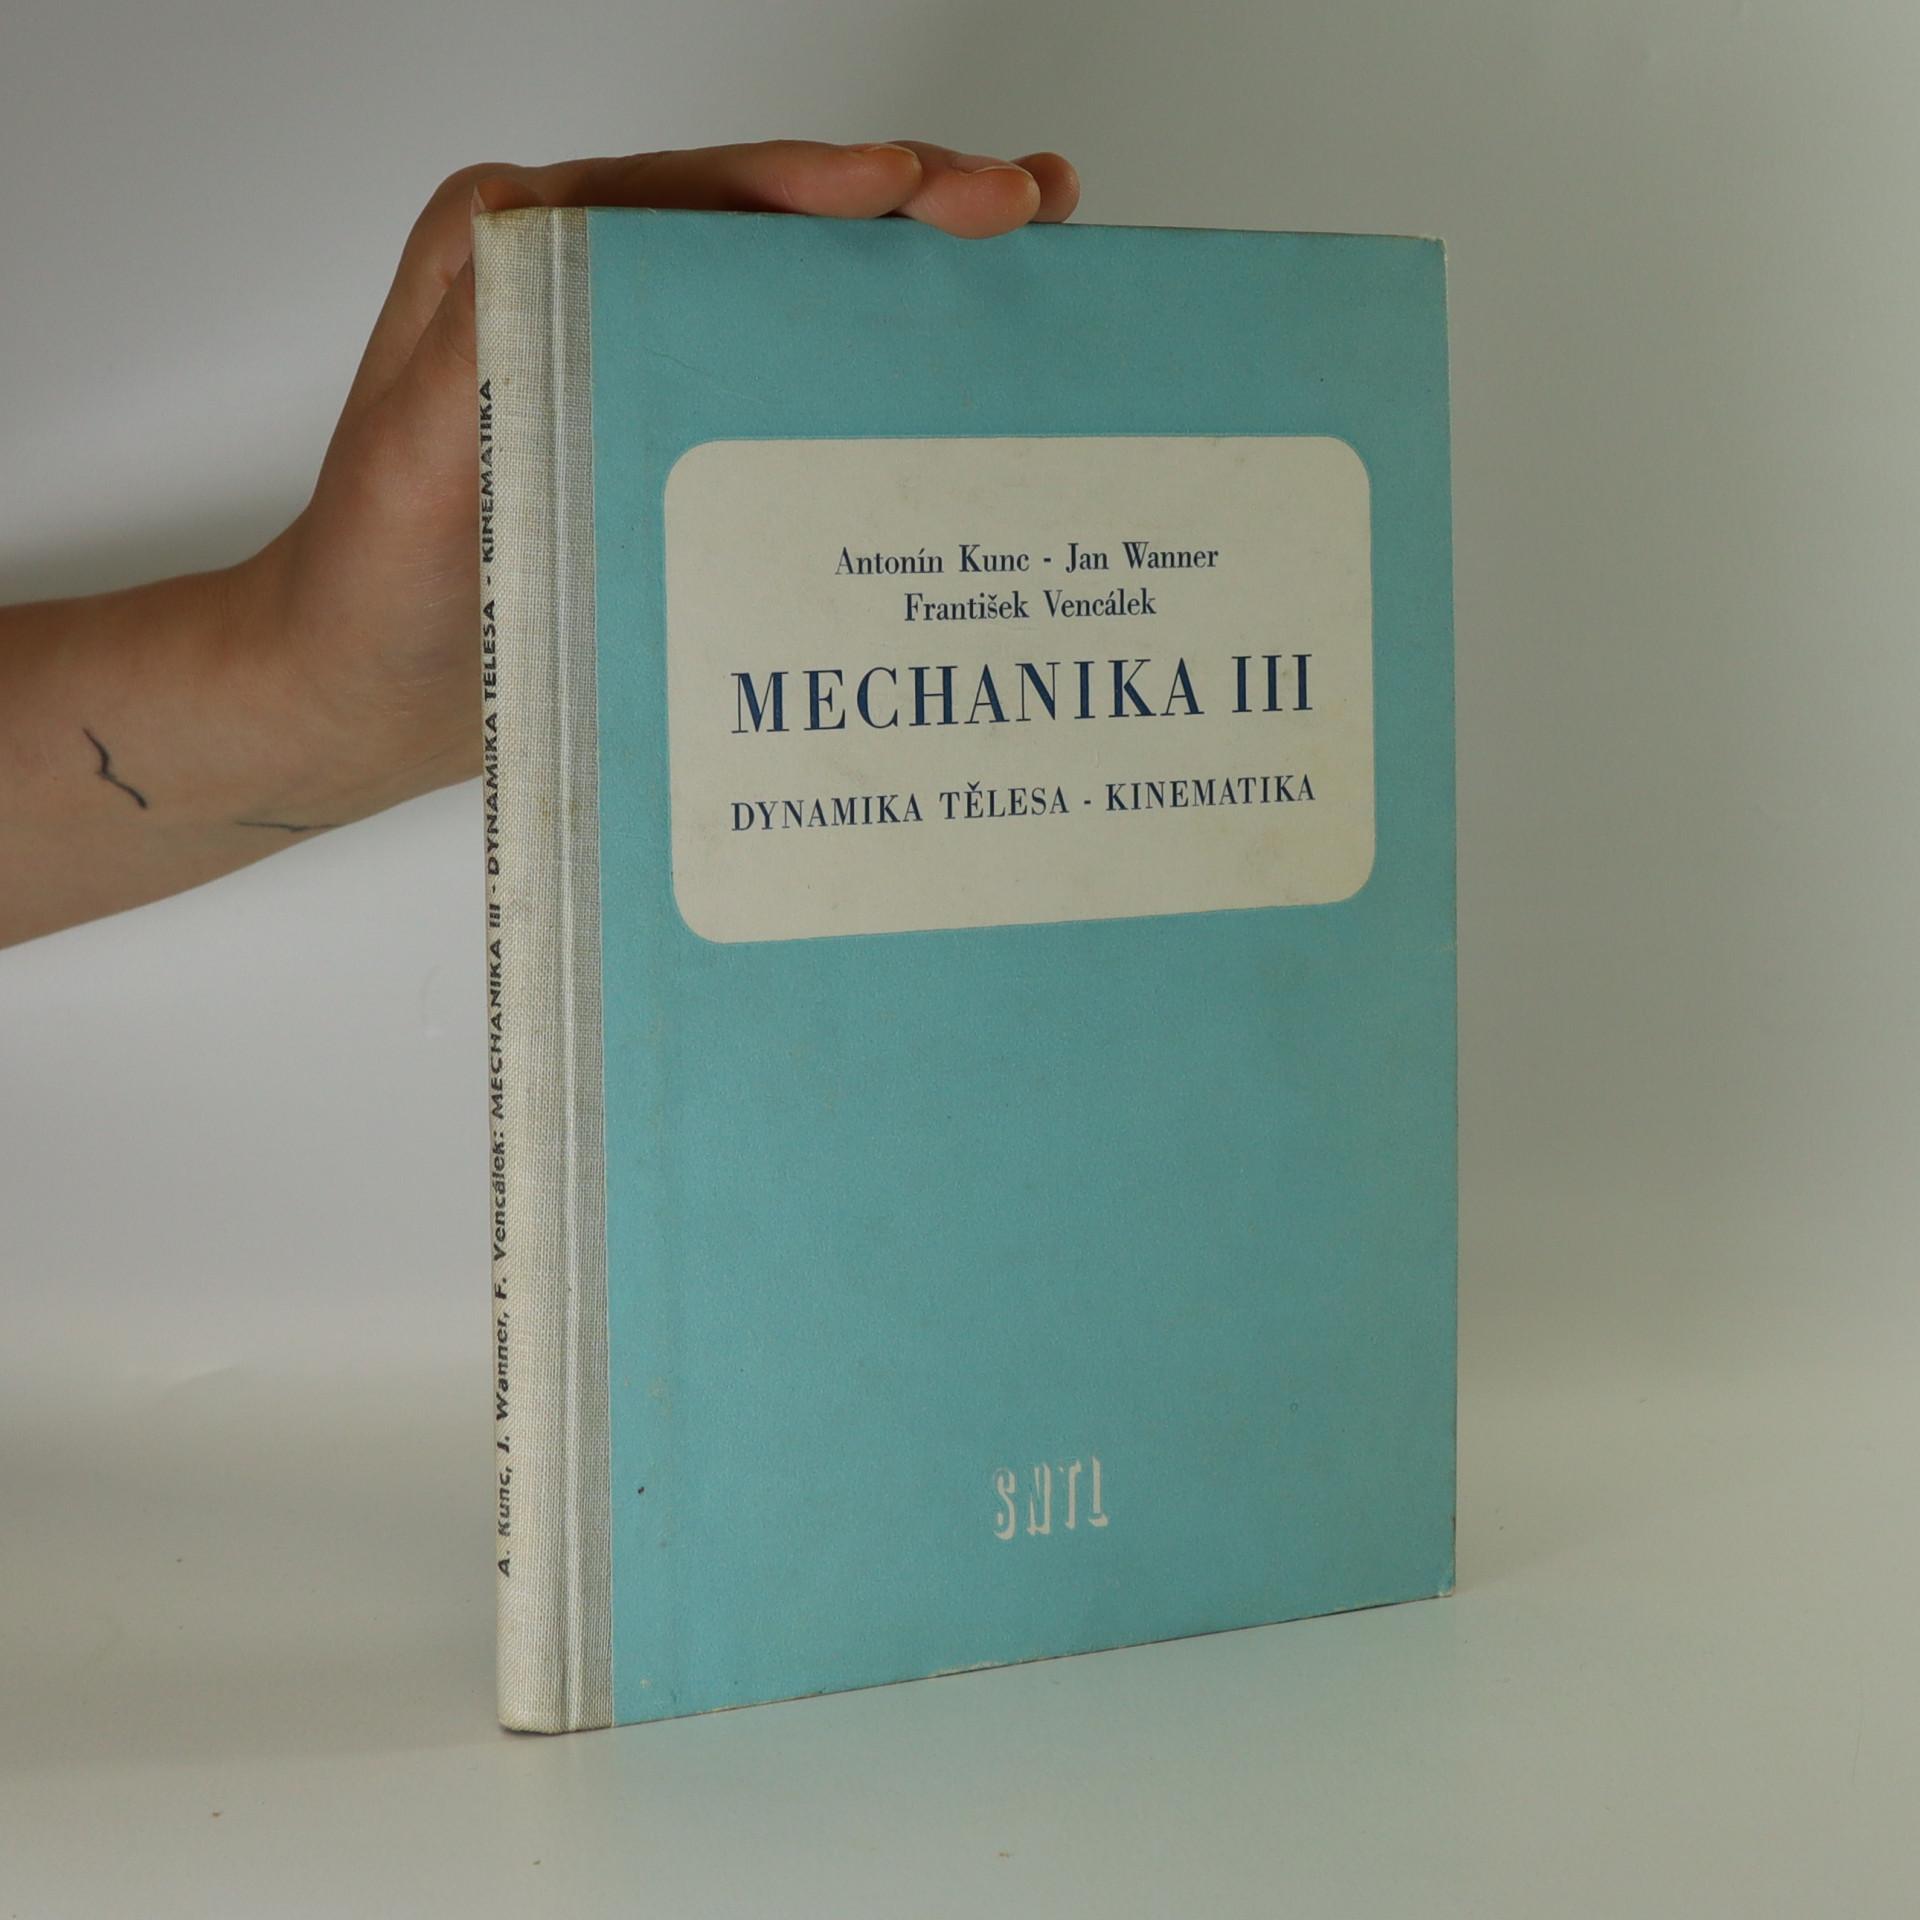 antikvární kniha Mechanika III. Dynamika tělesa - kinematika, 1957